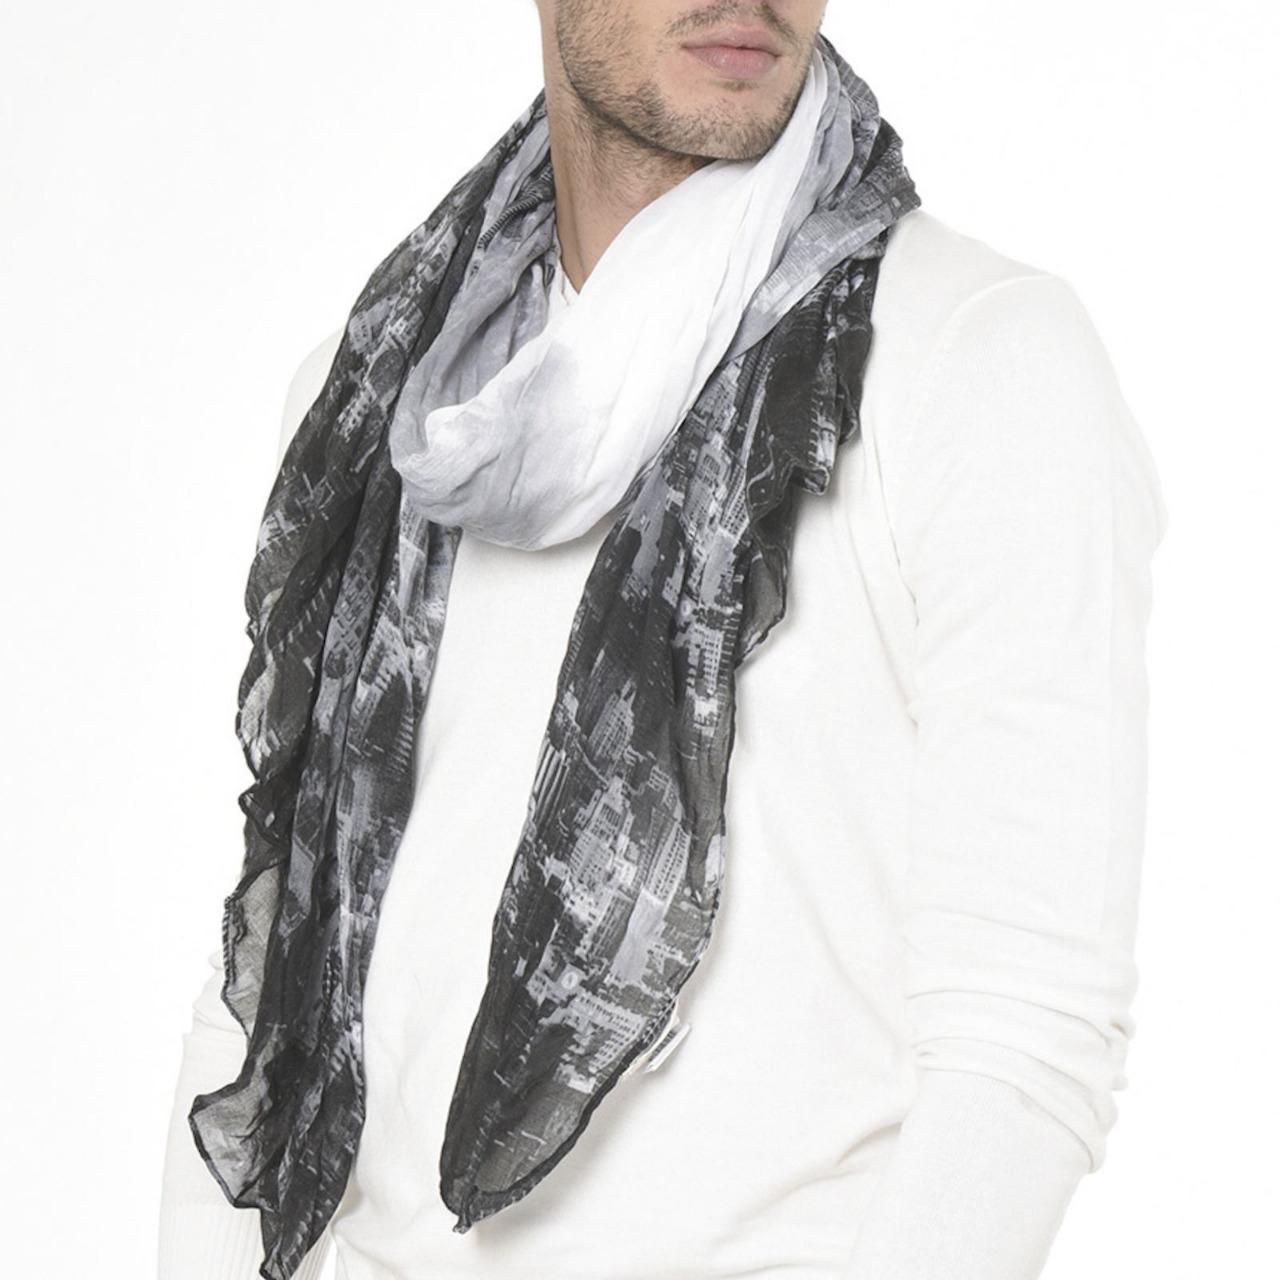 Kaporal echarpe homme - Idée pour s habiller 38f43f08332